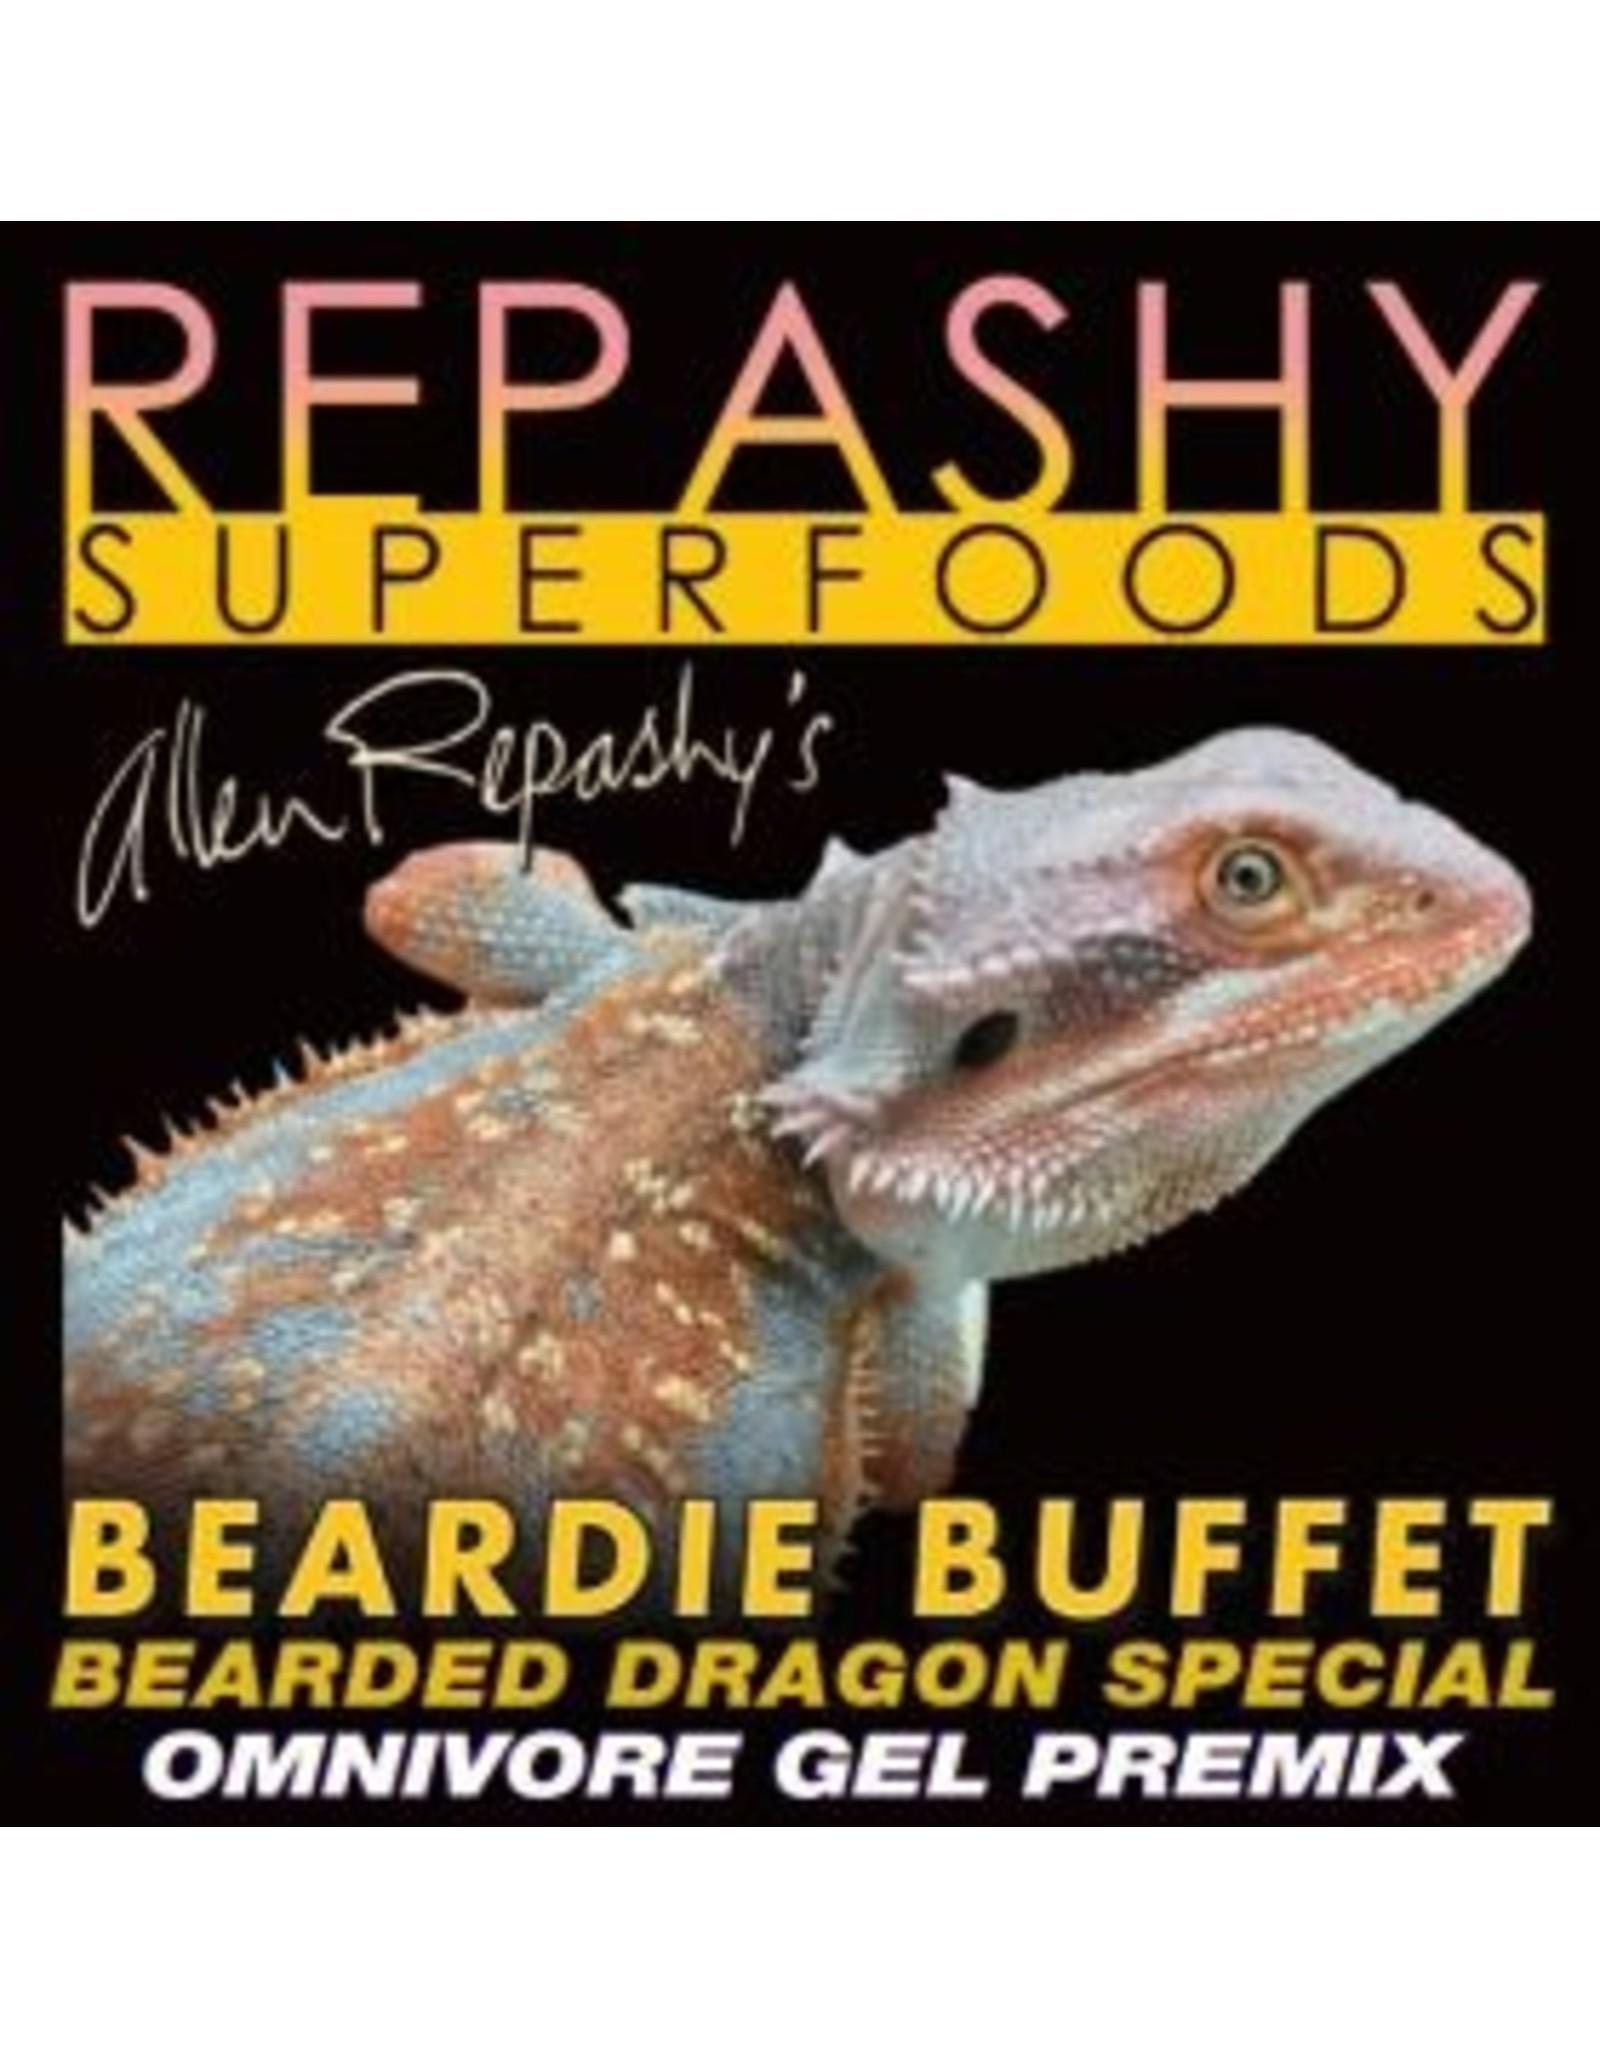 Repashy REPASHY Beardie Buffet